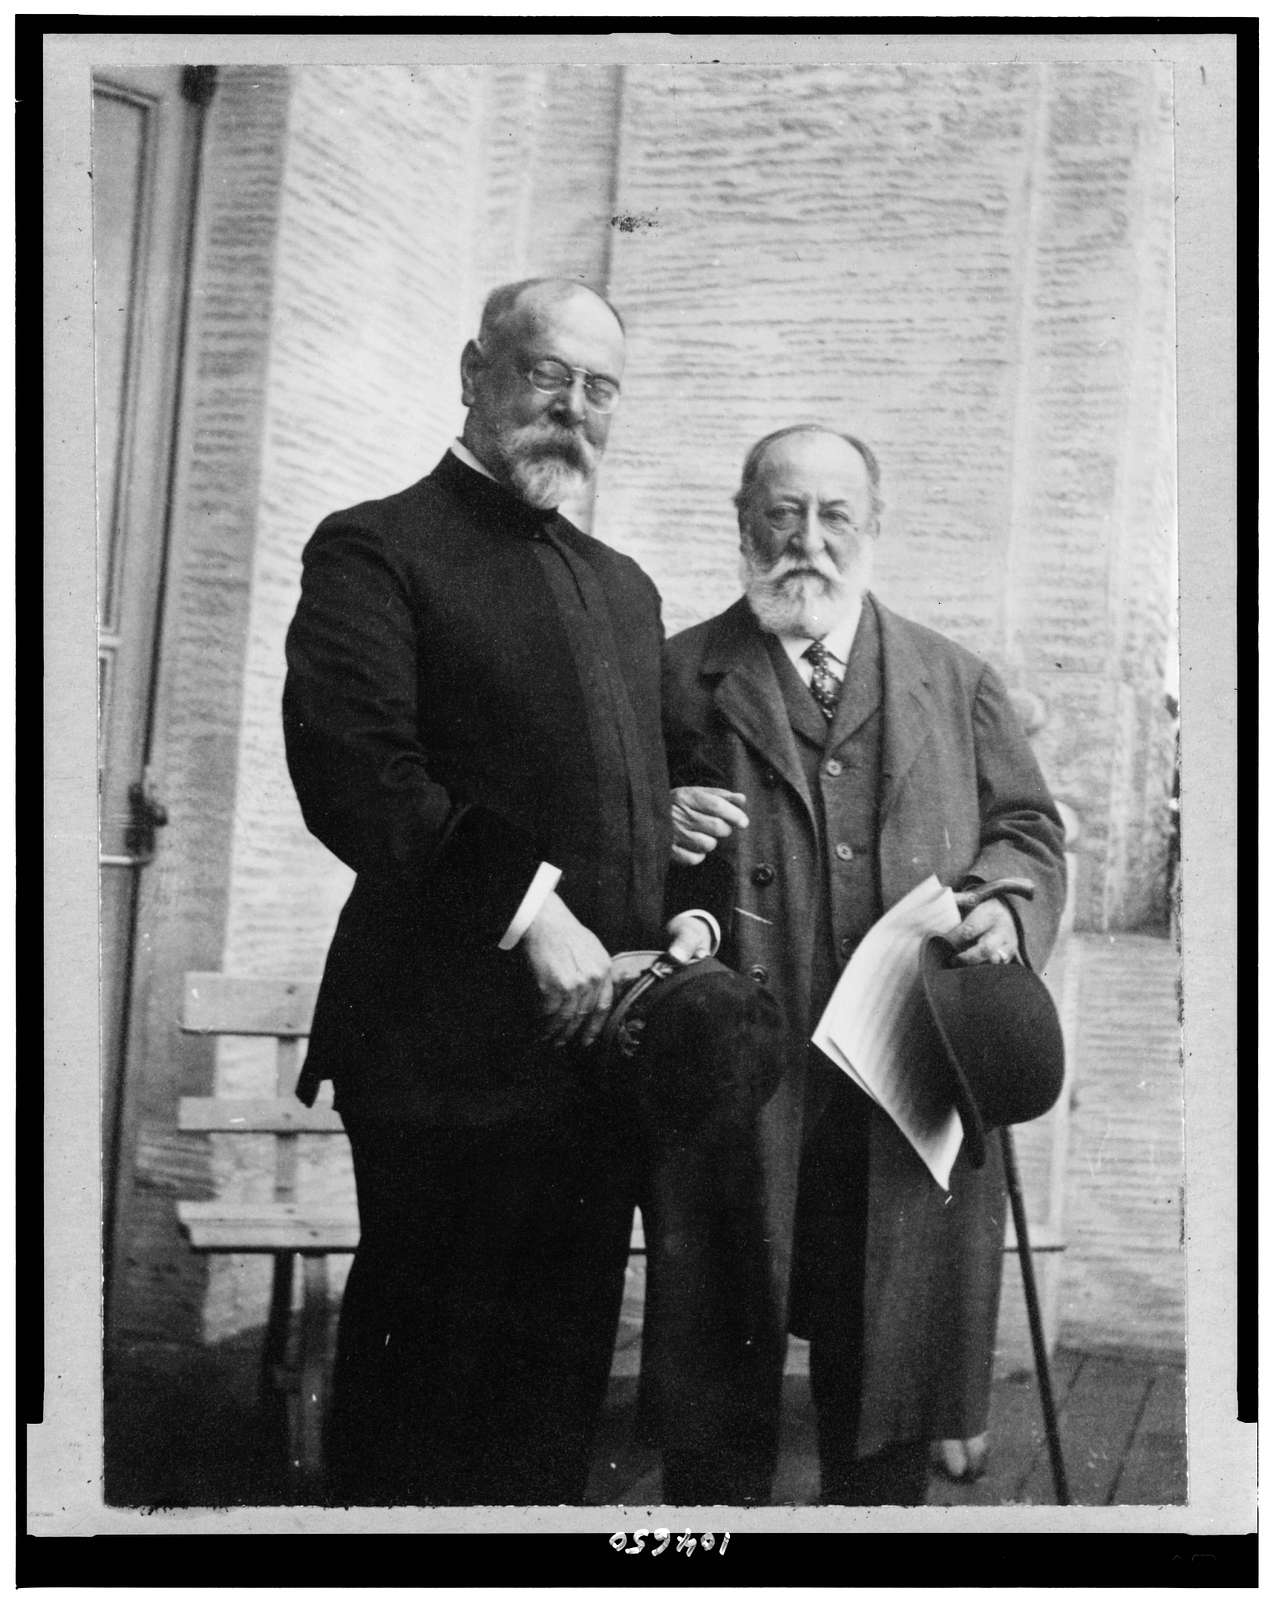 [John Philip Sousa standing with Camille Saint-Saëns]